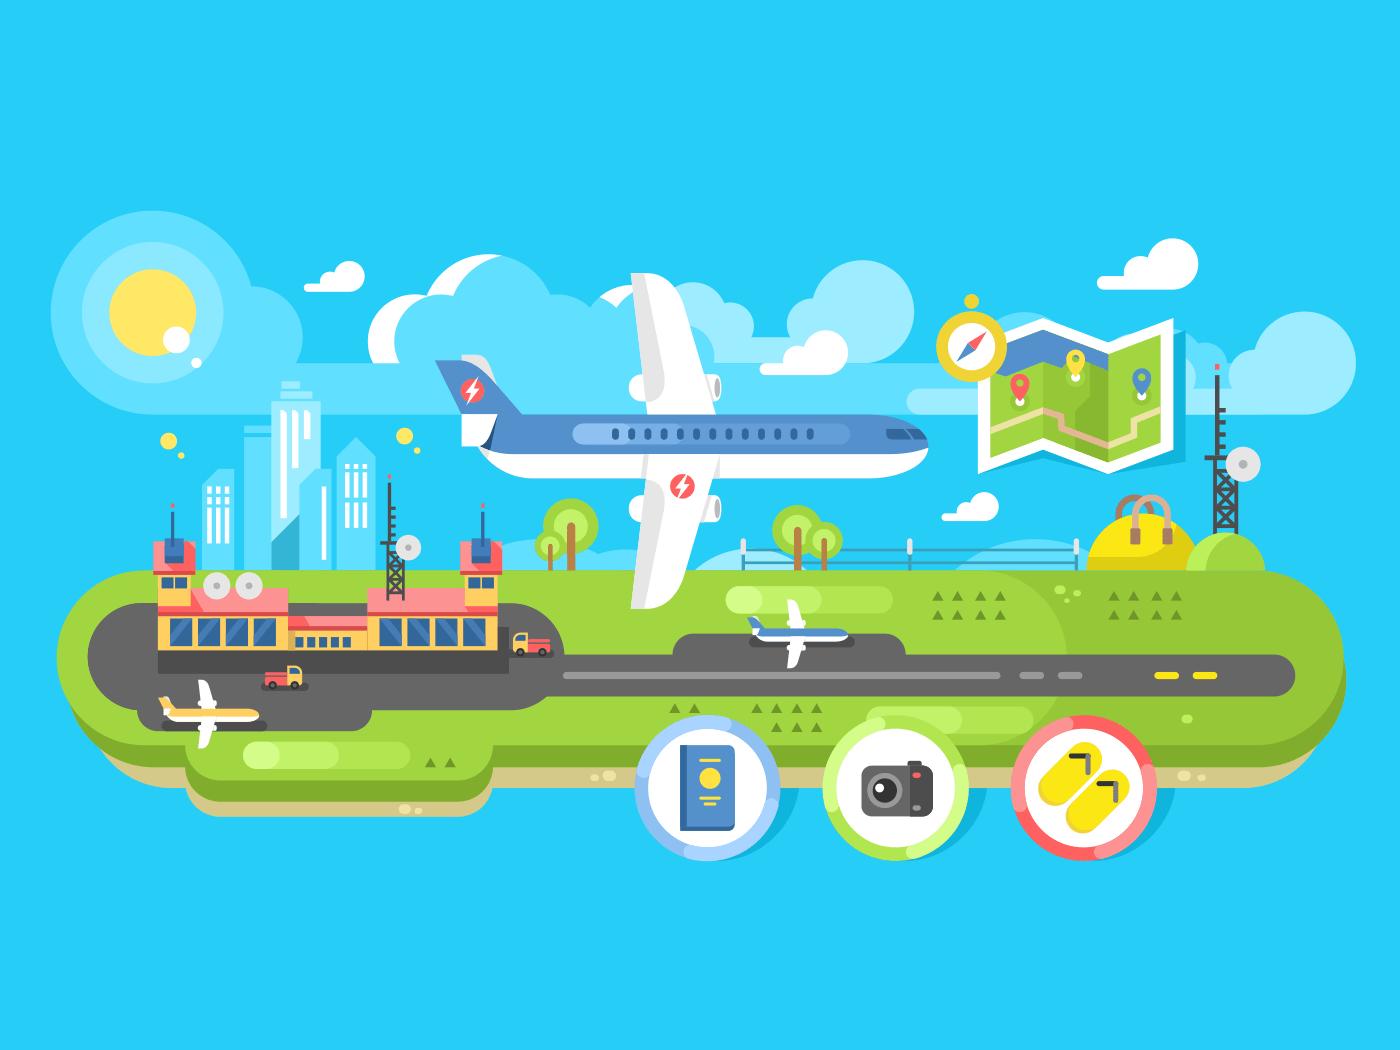 Airport building infrastructure flat vector illustration